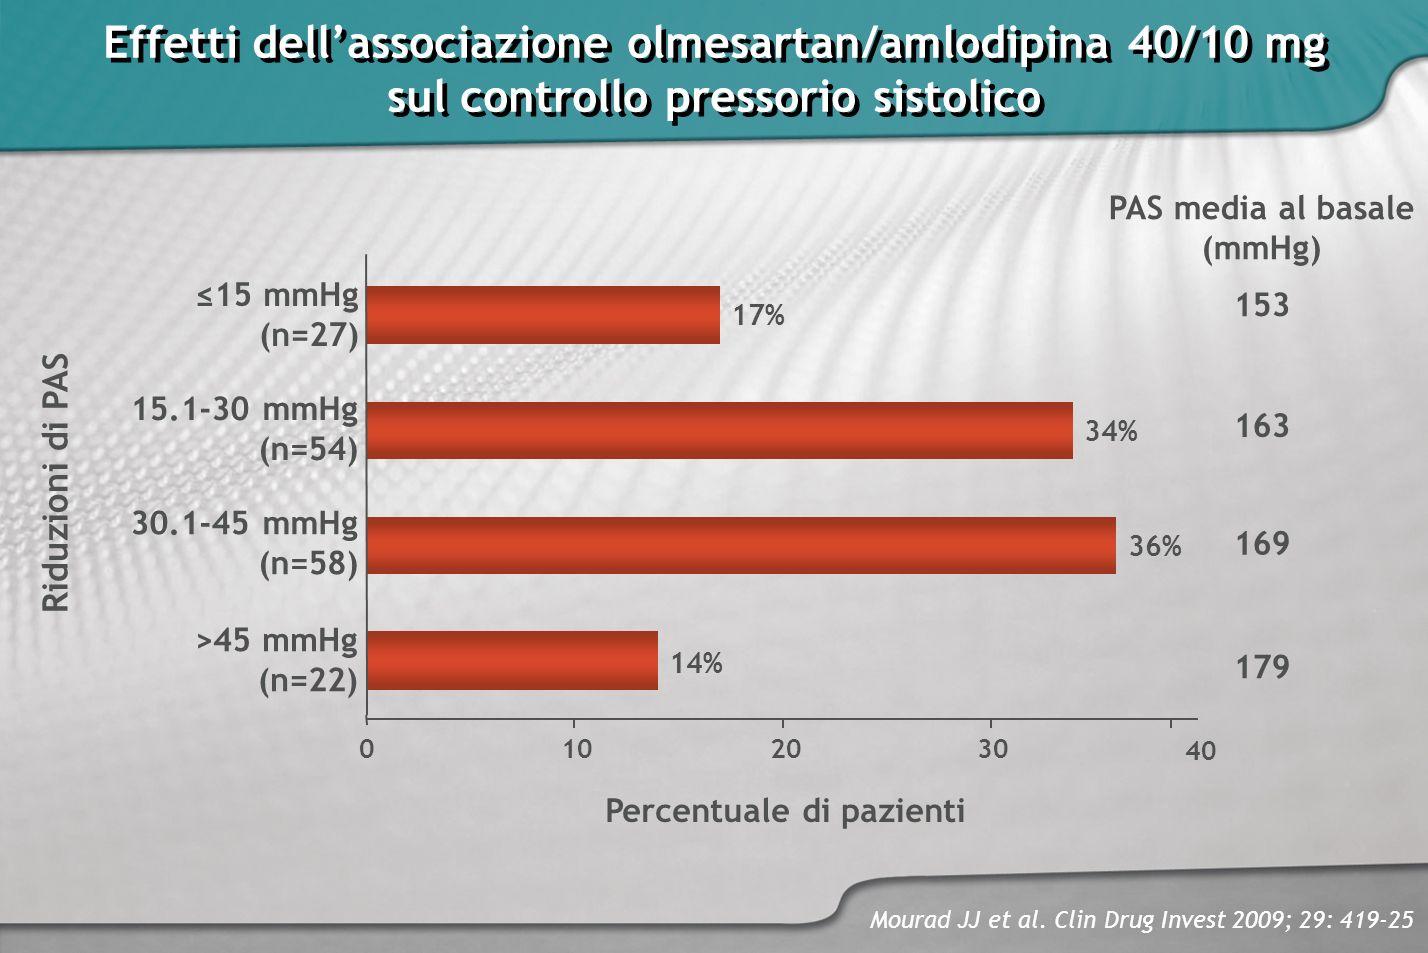 Effetti dell'associazione olmesartan/amlodipina 40/10 mg